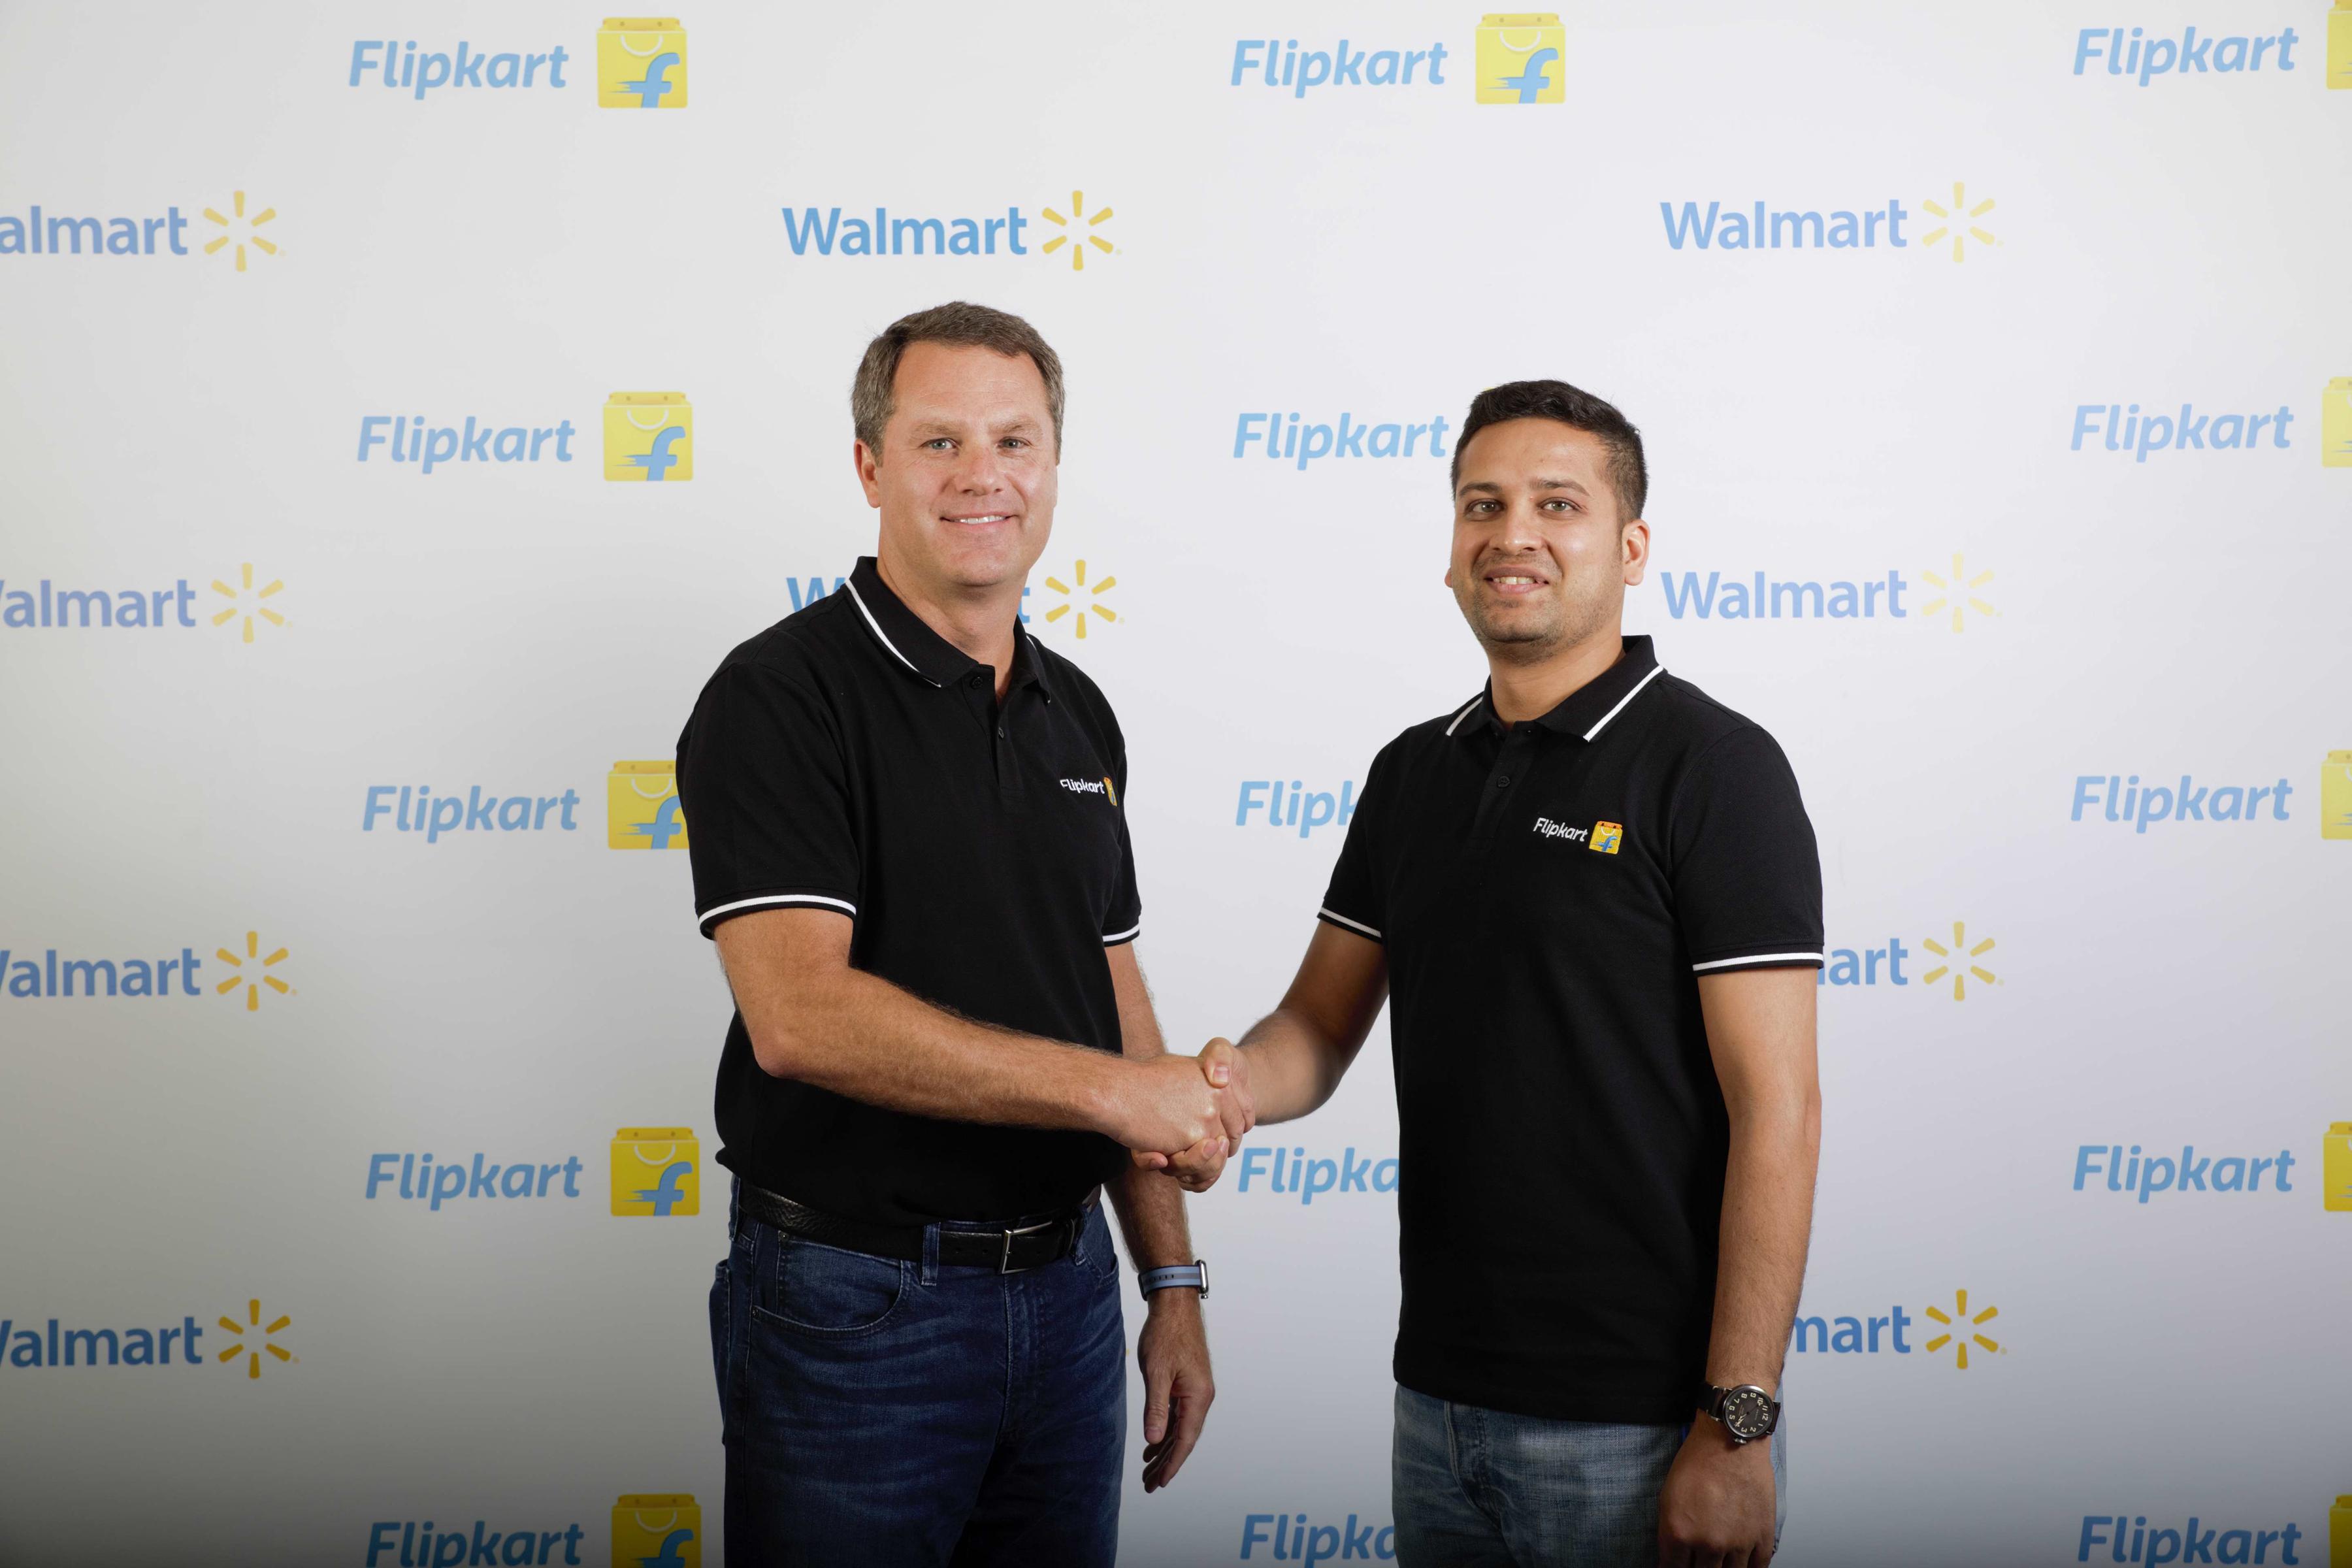 Walmart CEO Doug McMillon shakes hands and poses with Flipkart co-founder Binny Bansal